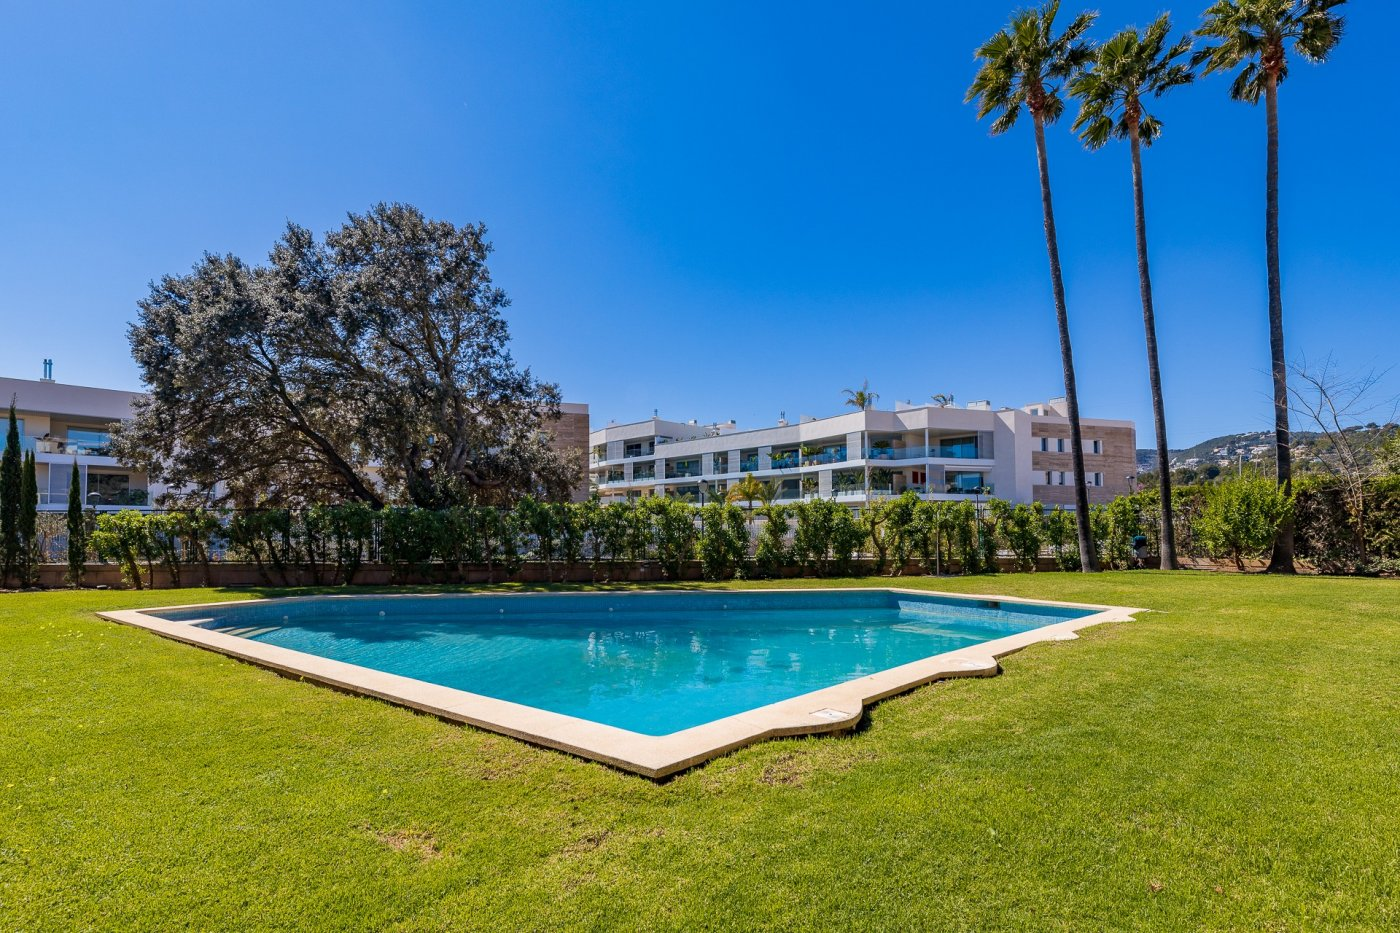 Zona colegios. arabella park. se vende atico con piscina comunitaria. palma mallorca - imagenInmueble0